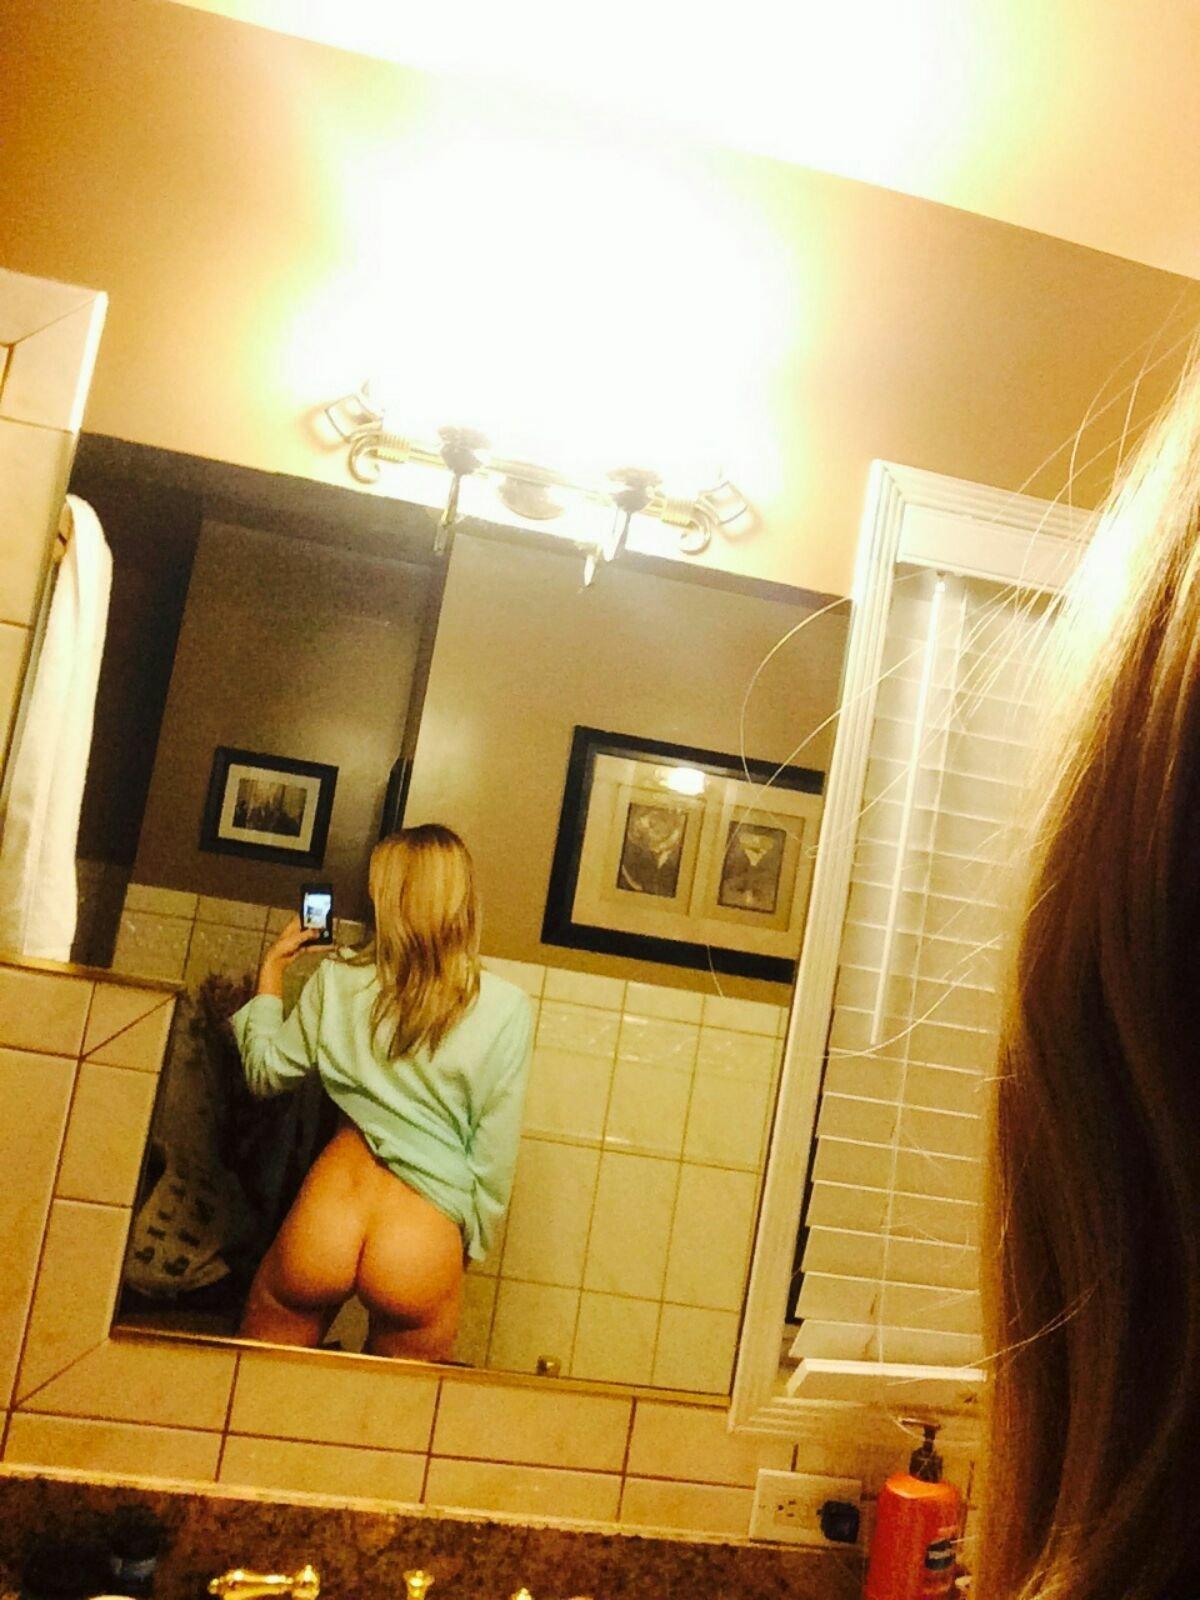 AJ Michalka nice tits